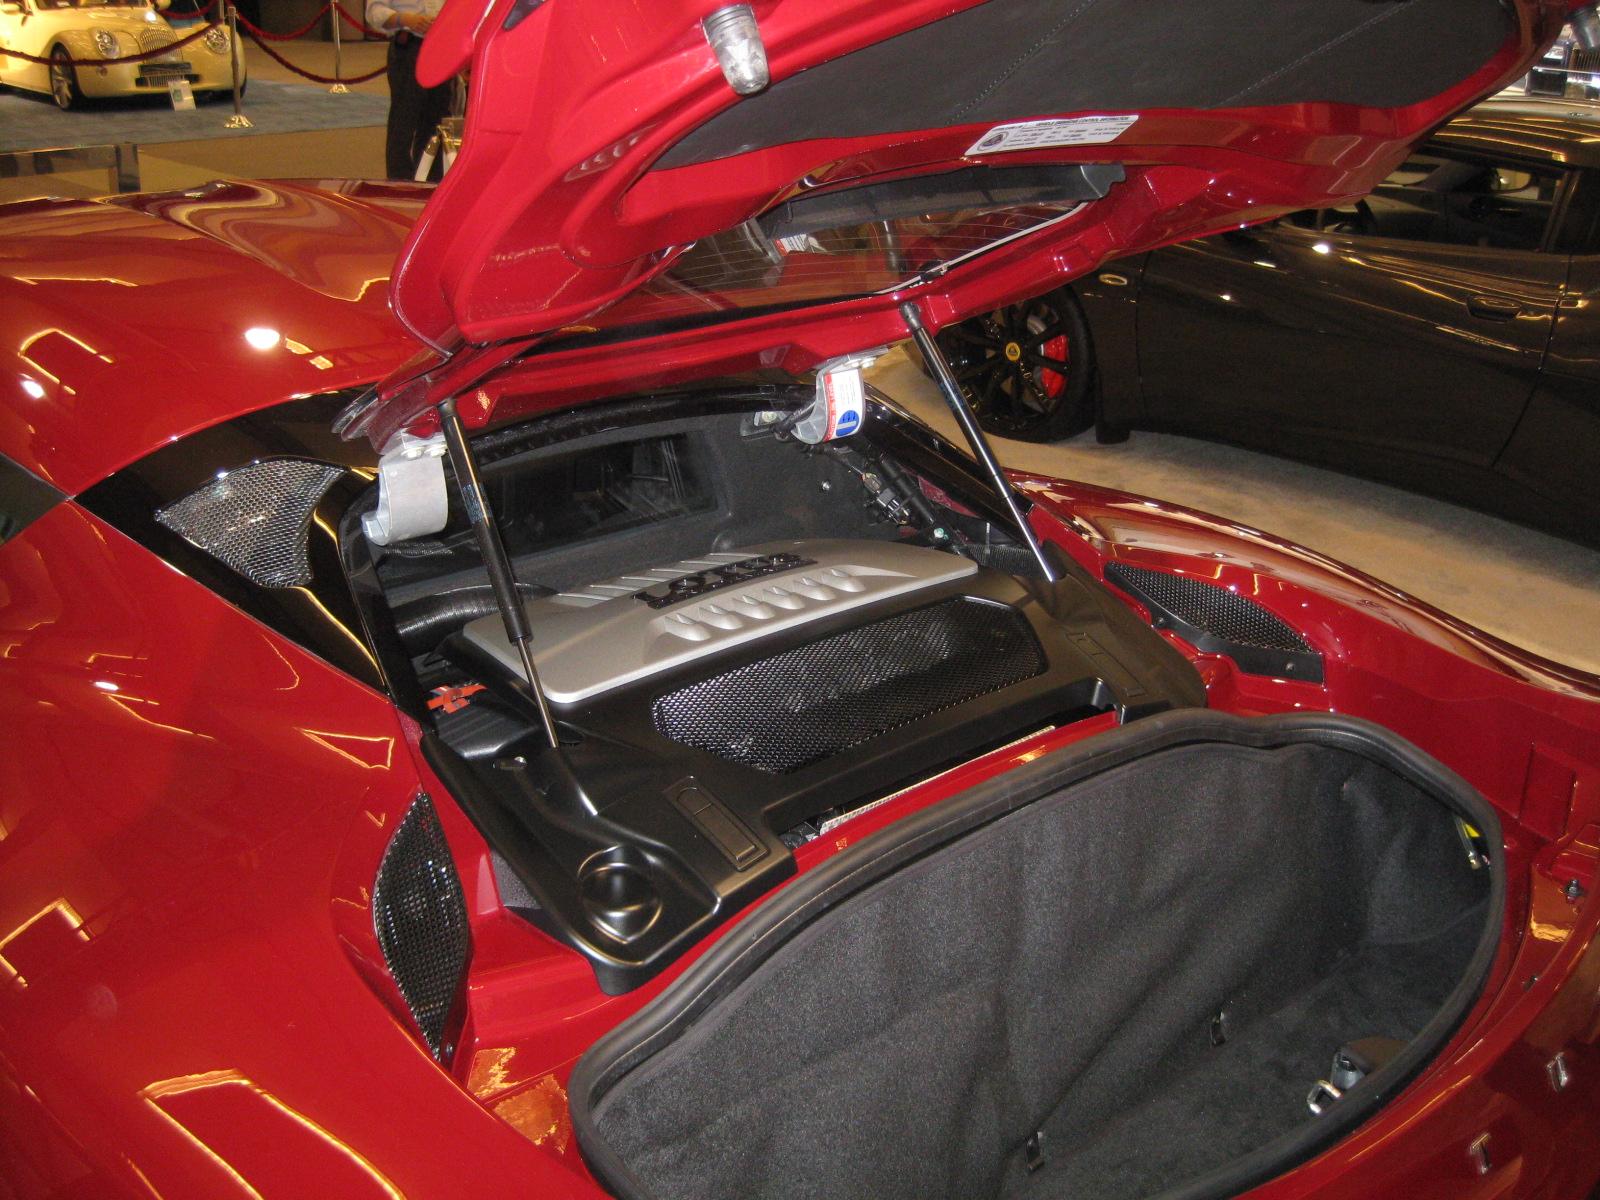 Mazda Green Bay >> 2012_Lotus_Evora_engine_bay | Todd Bianco's ACarIsNotARefrigerator.com Blog